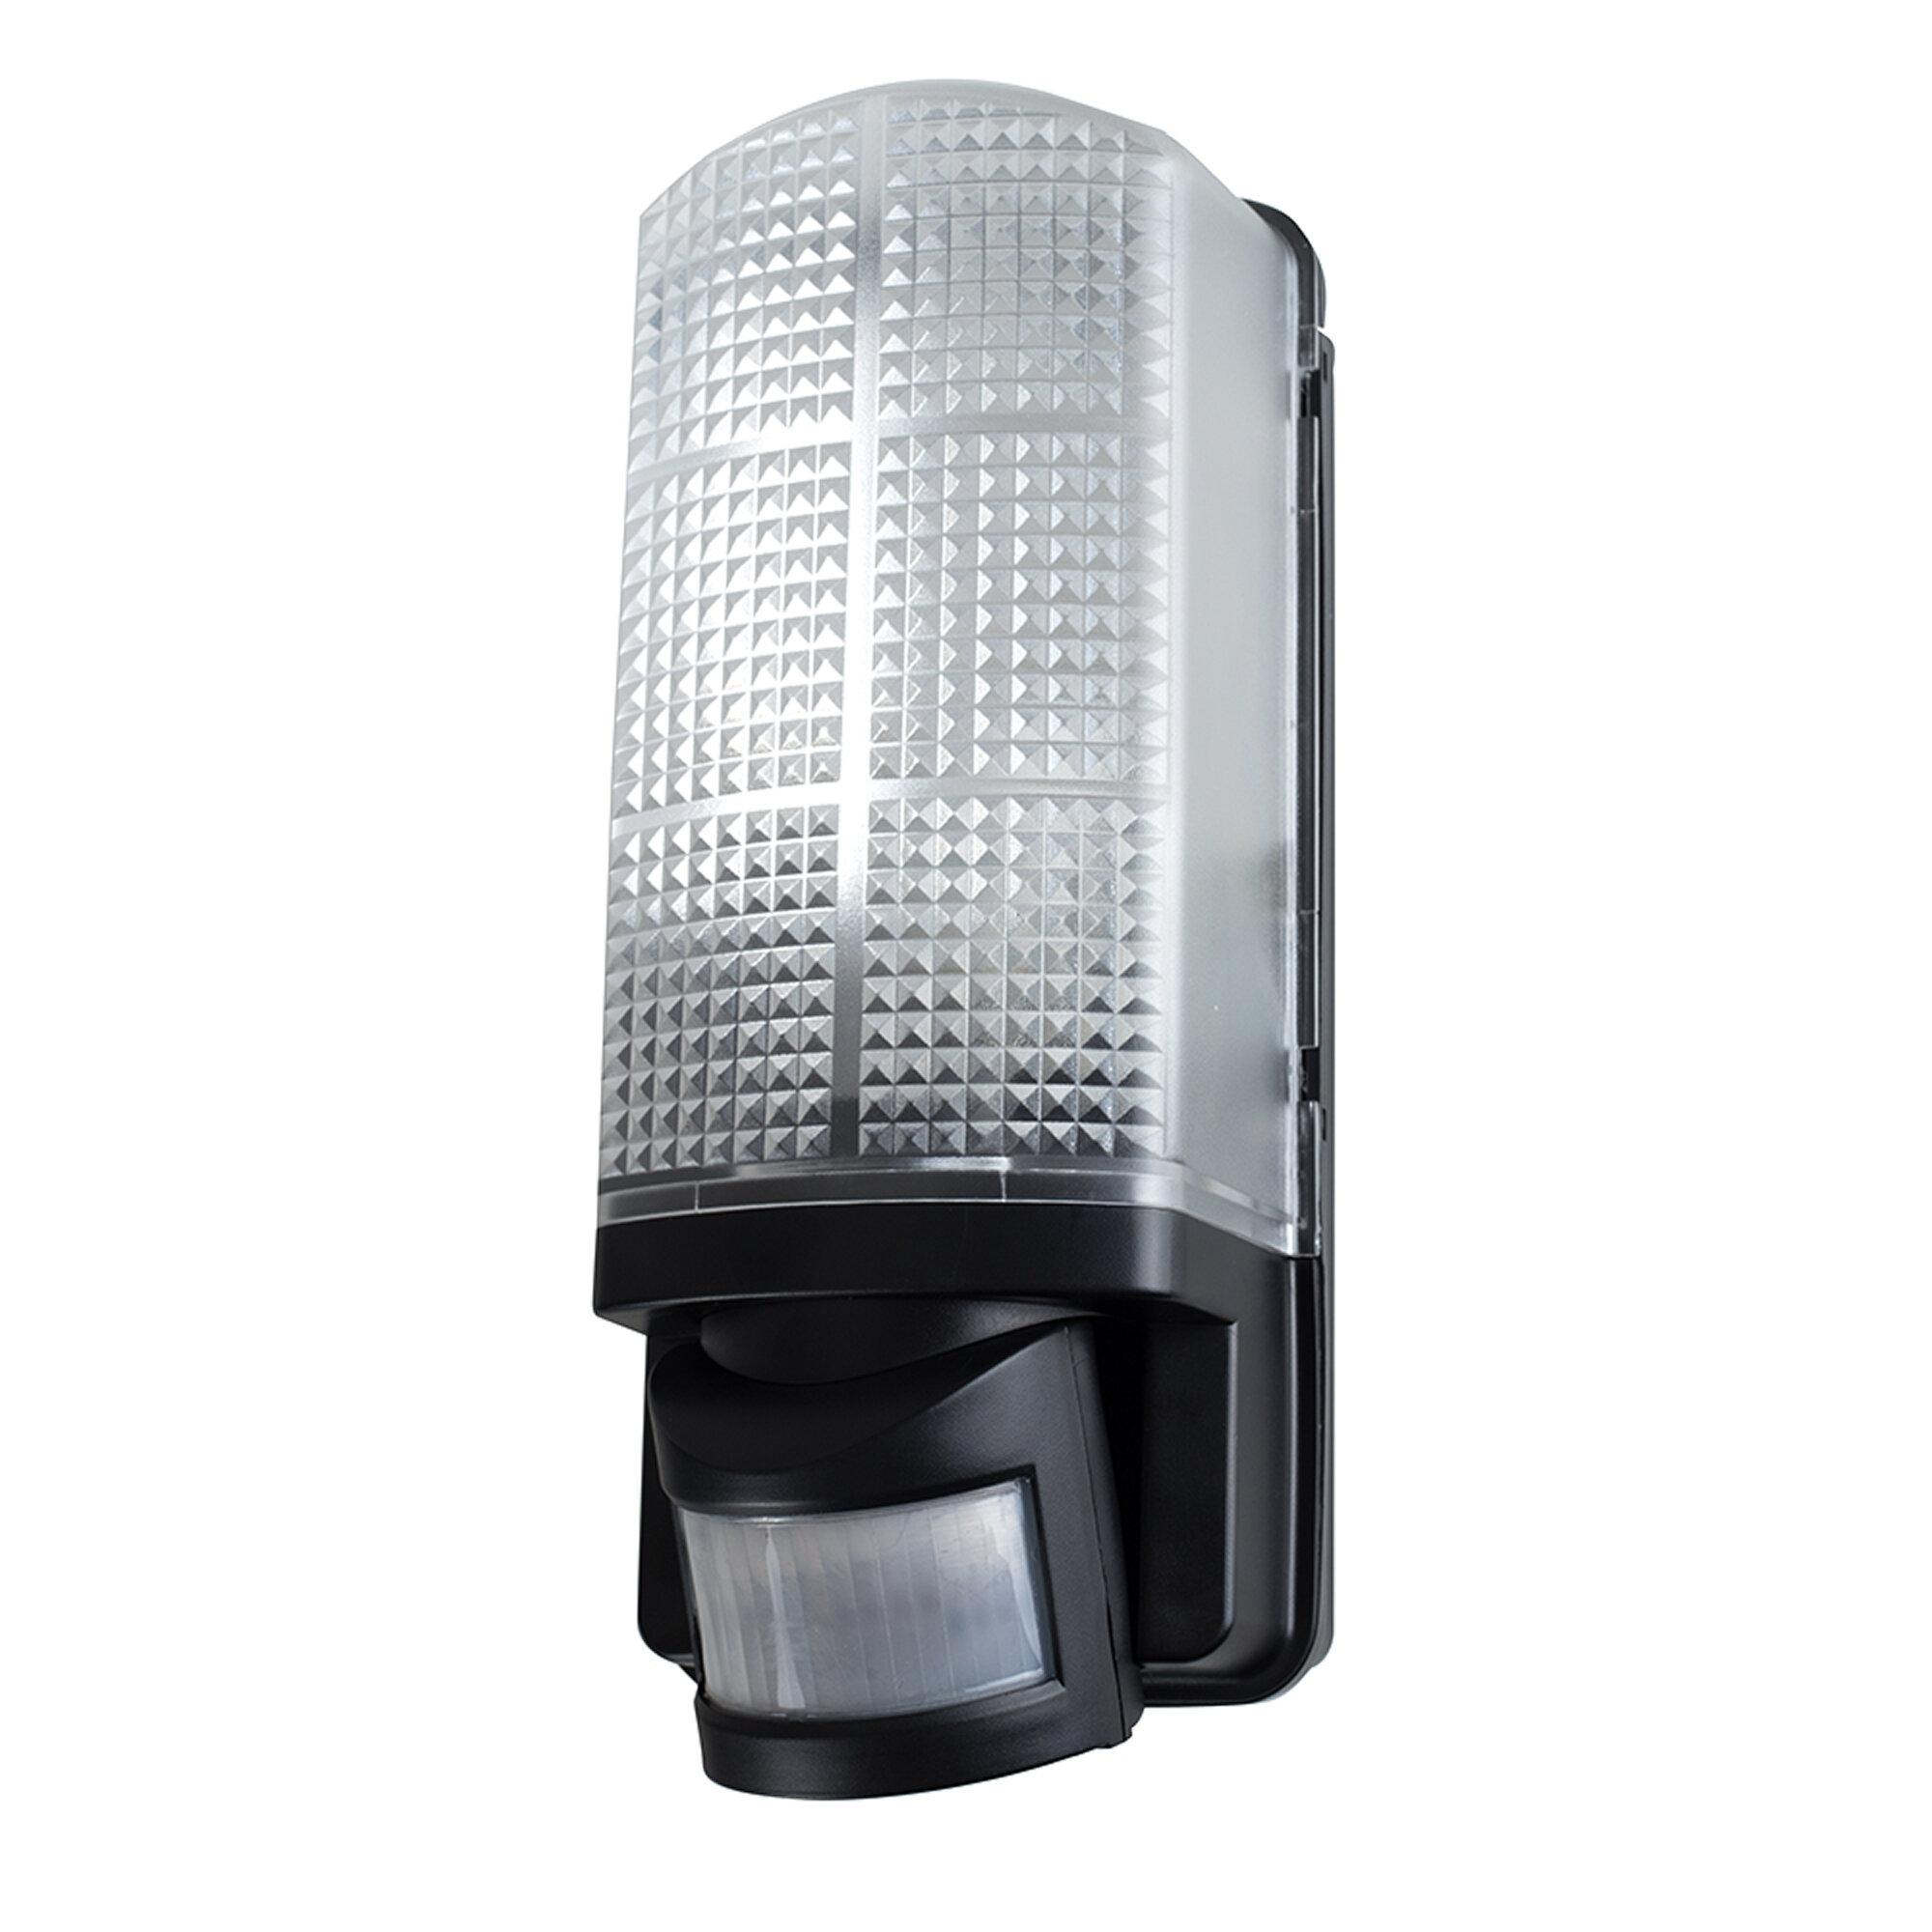 Minisun griffin 1 light outdoor bulkhead light with motion sensor minisun griffin 1 light outdoor bulkhead light with motion sensor wayfair mozeypictures Image collections